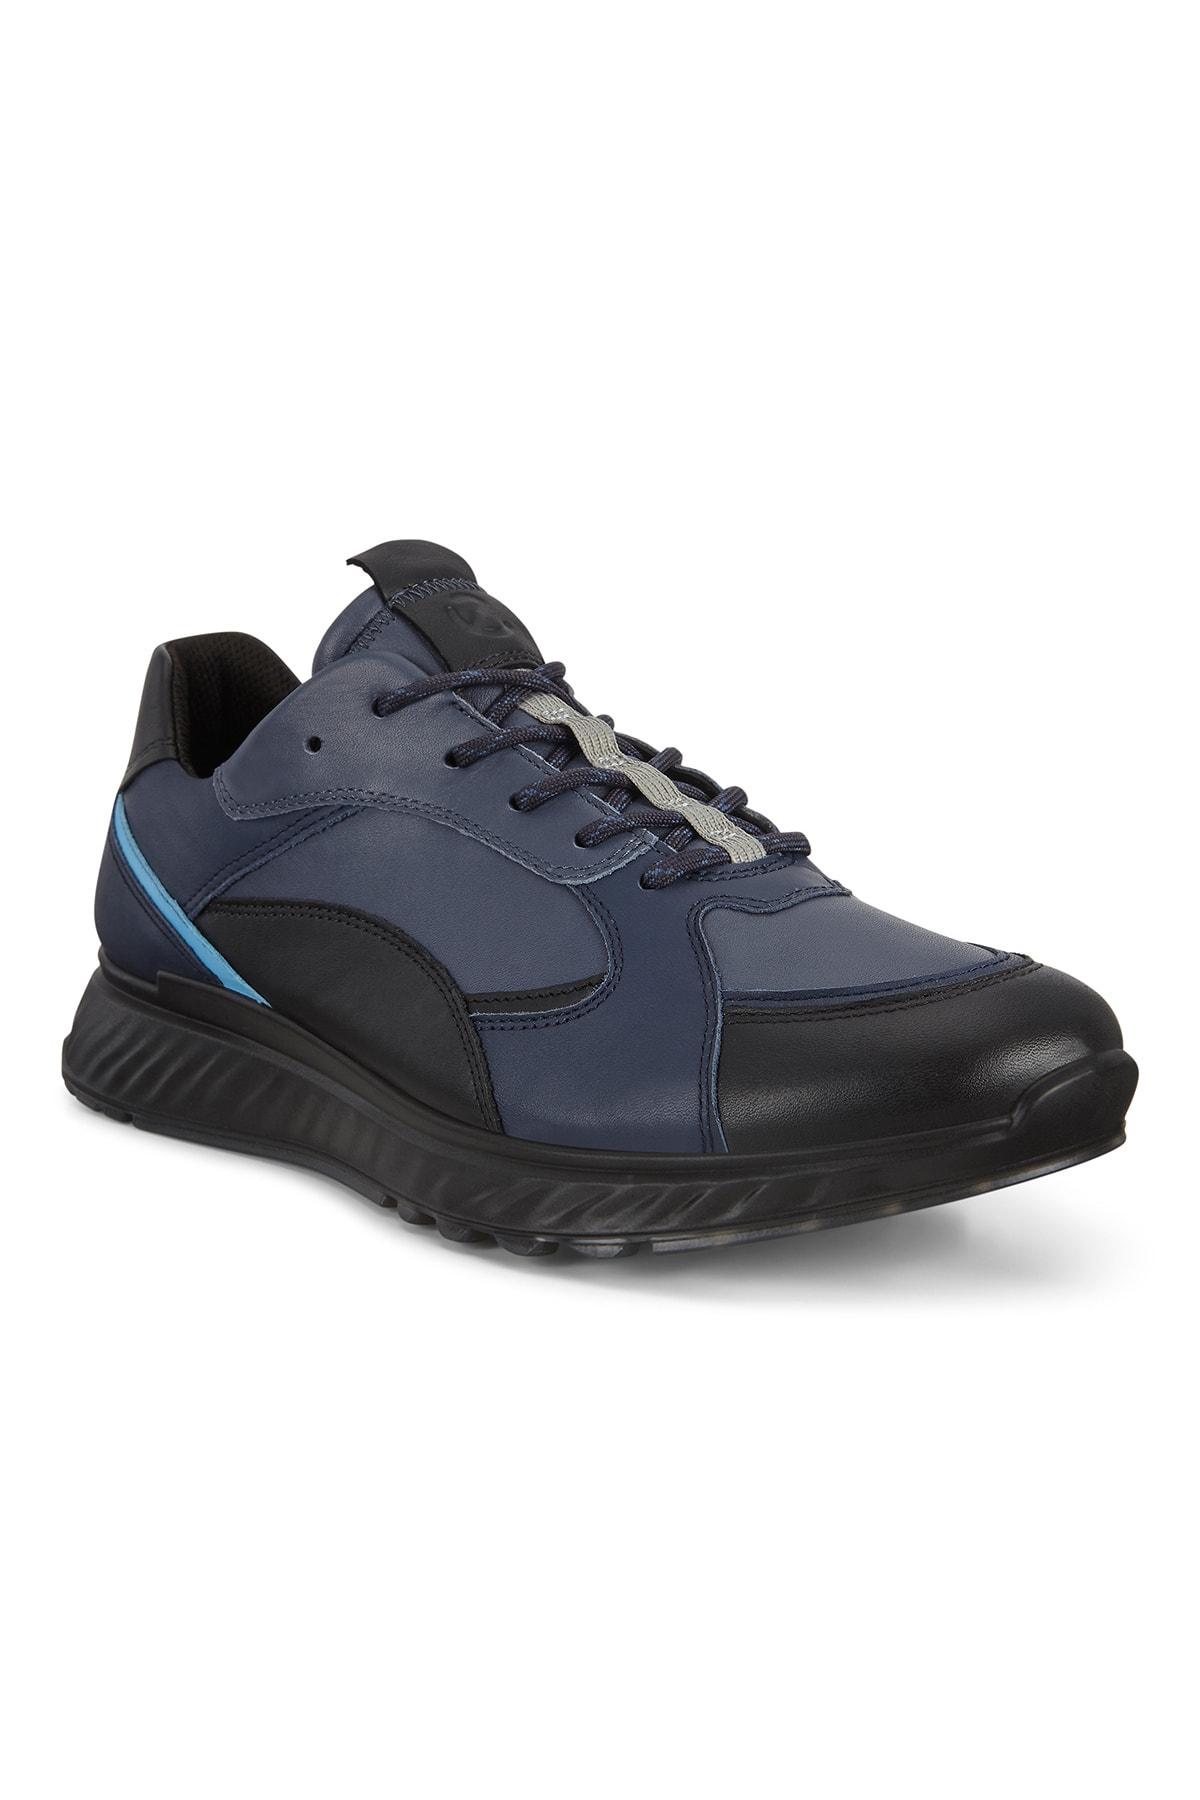 Ecco Lacivert Erkek St.1 M Black/Marine/Ombre/Sky Blue Outdoor Ayakkabı 836234 1